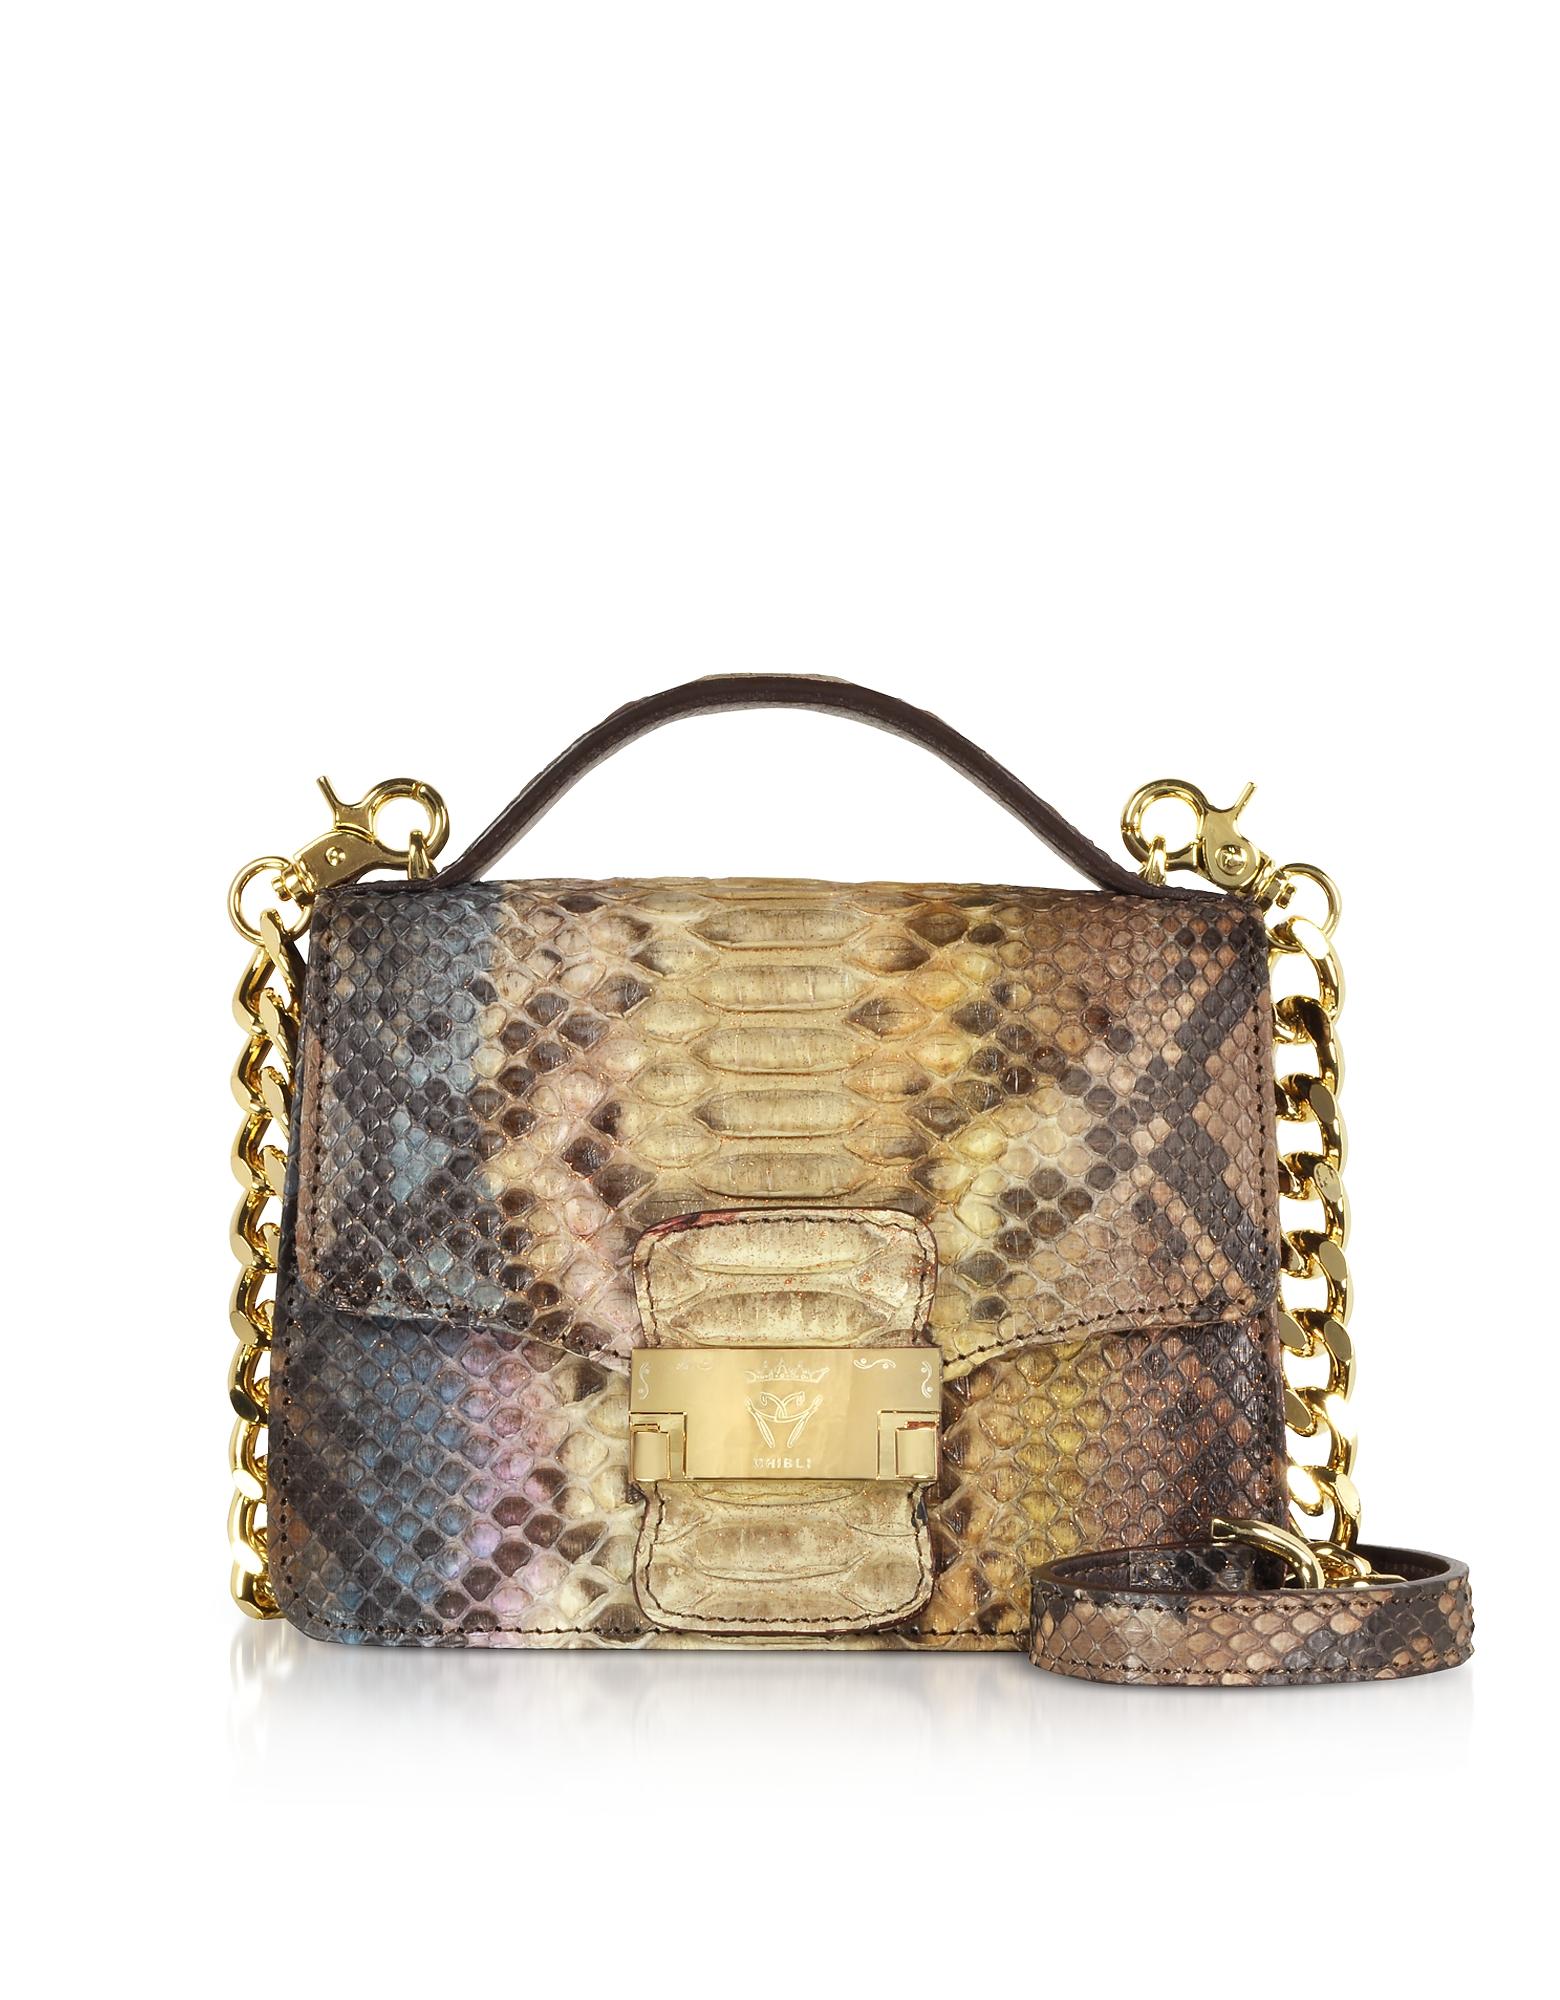 Ghibli Handbags, Brown Paillette Python Leather Crossbody Bag